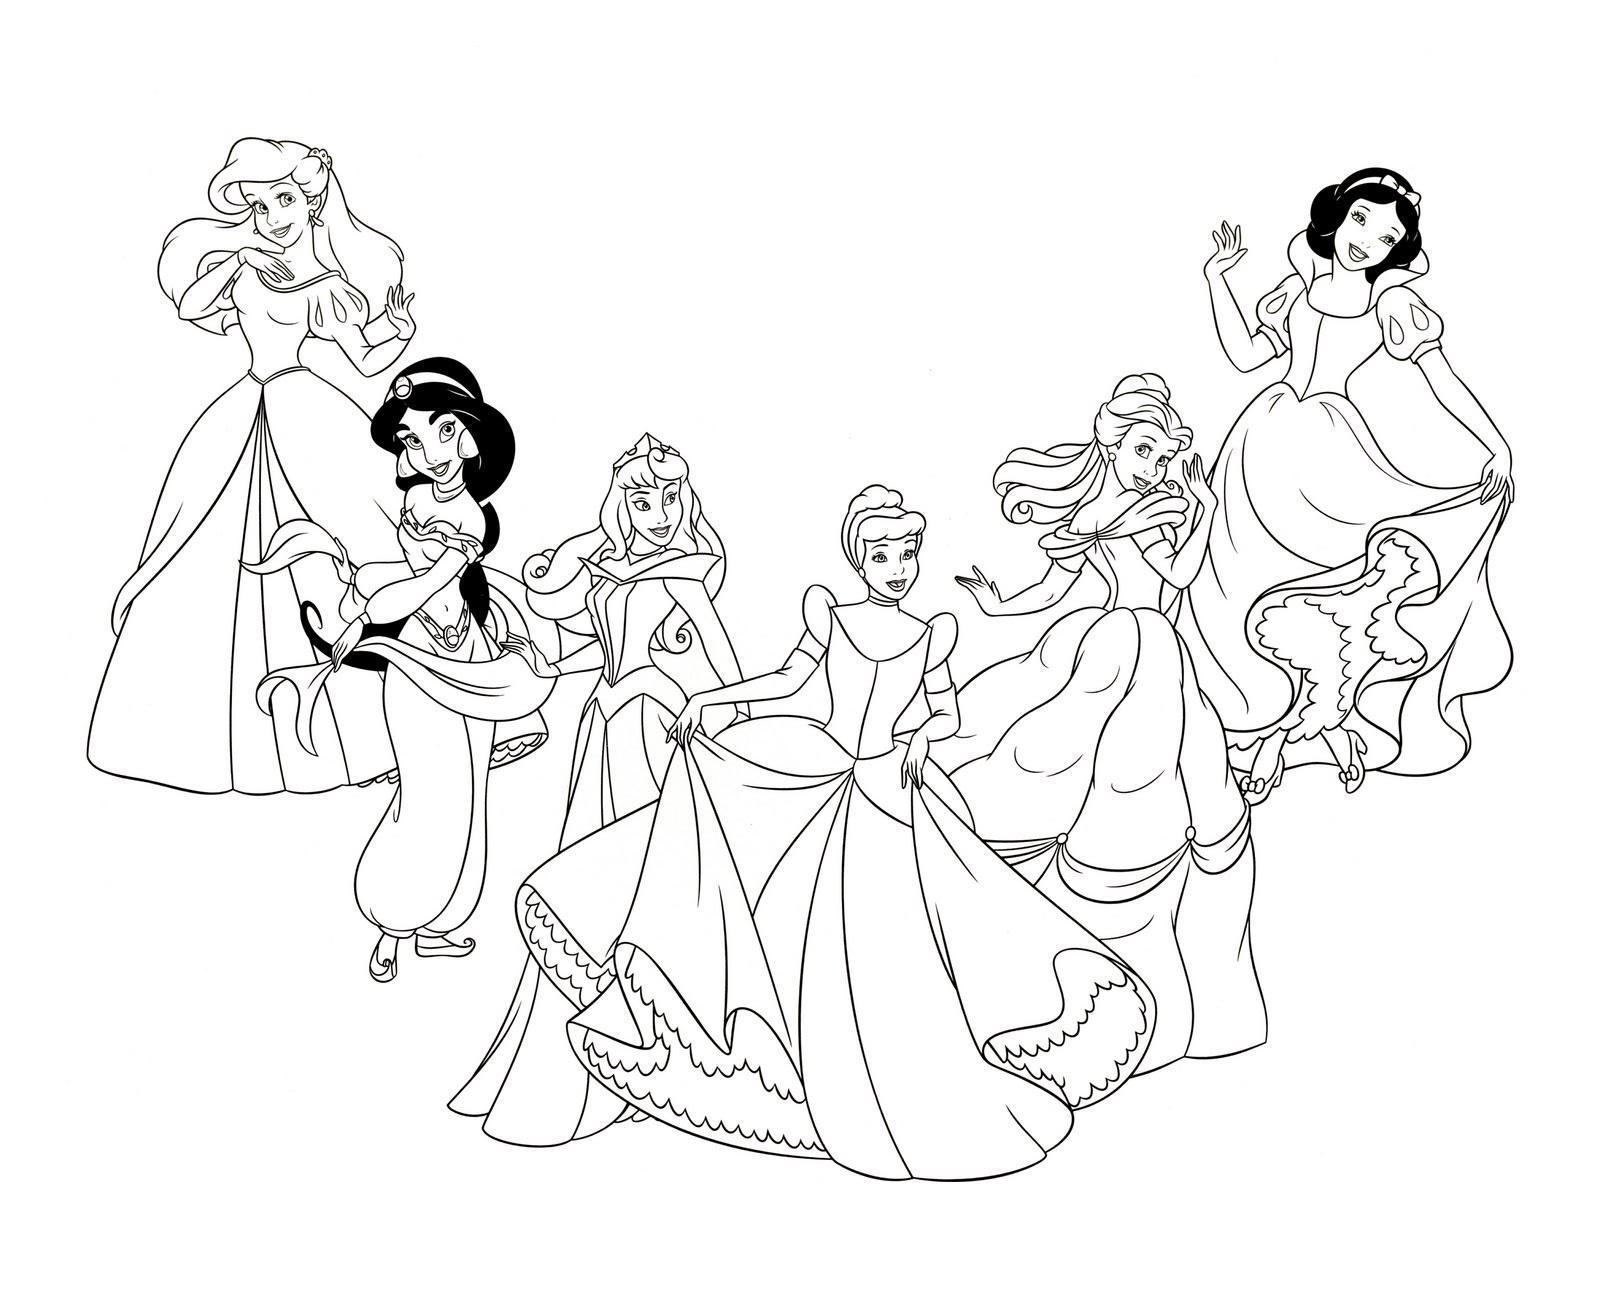 Dibujo Disney. Fabulous Dibujos Para Colorear Disney